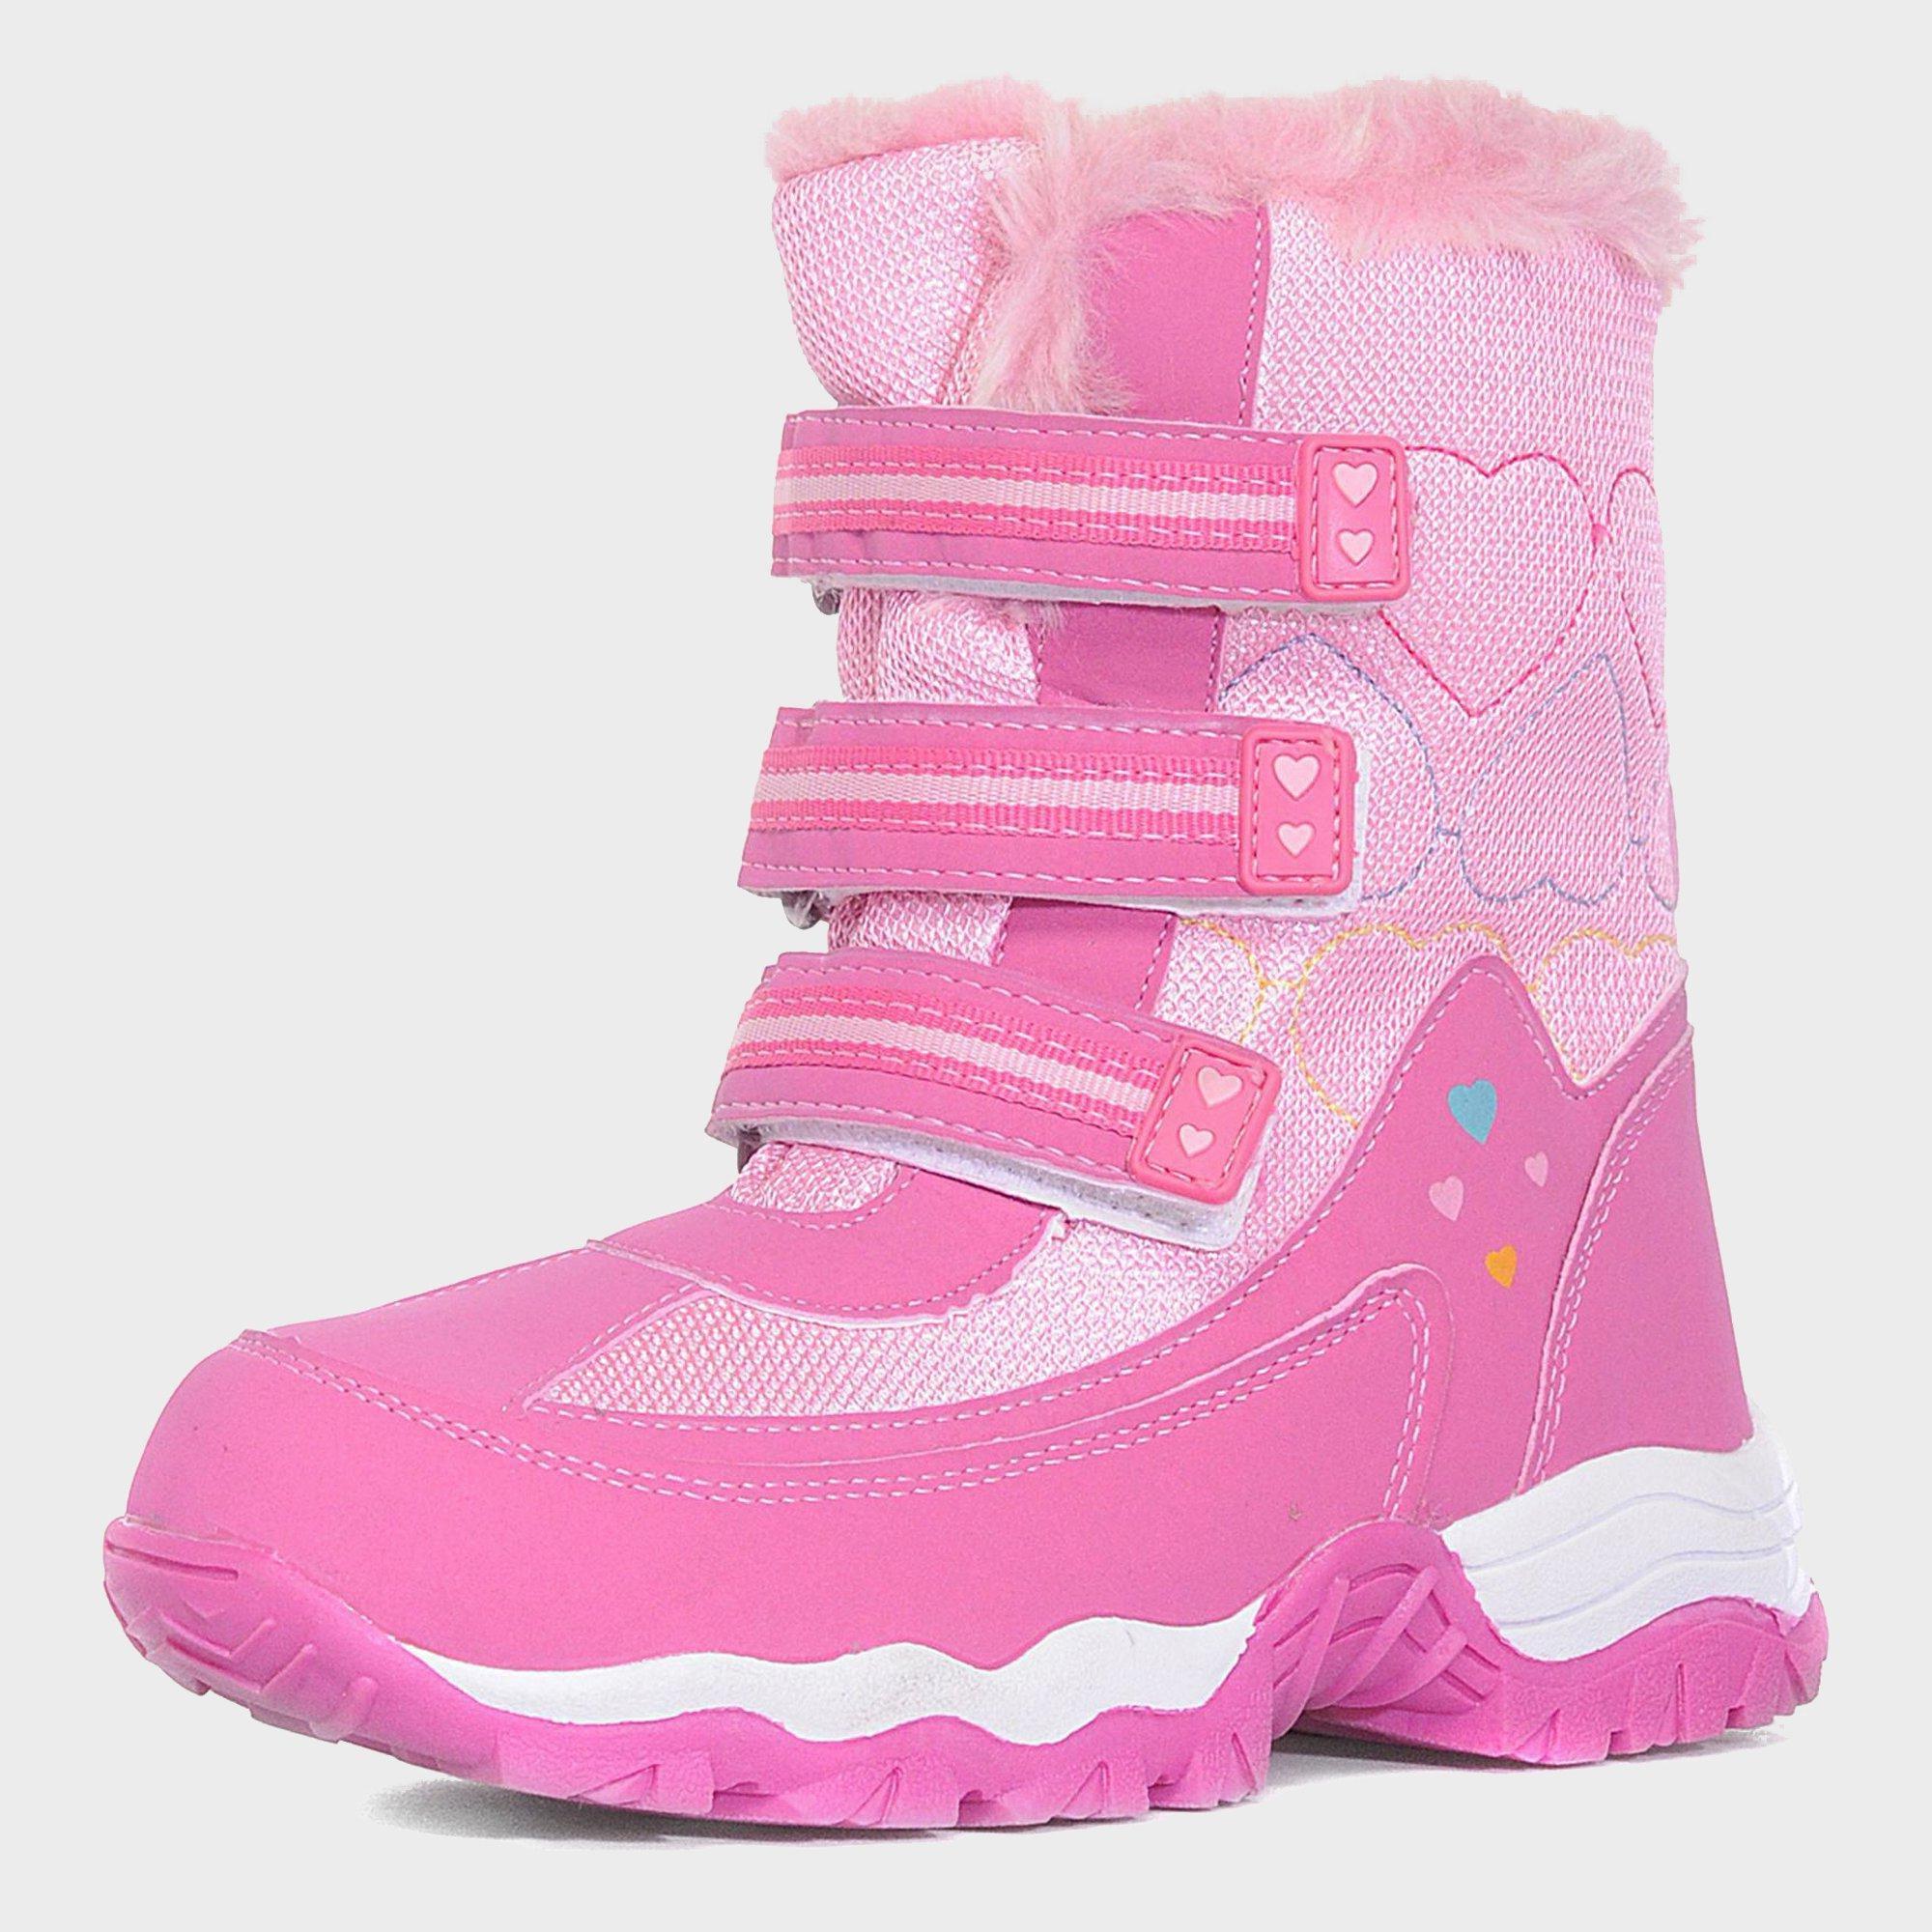 Alpine Girls' Fur Snow Boots, Pink